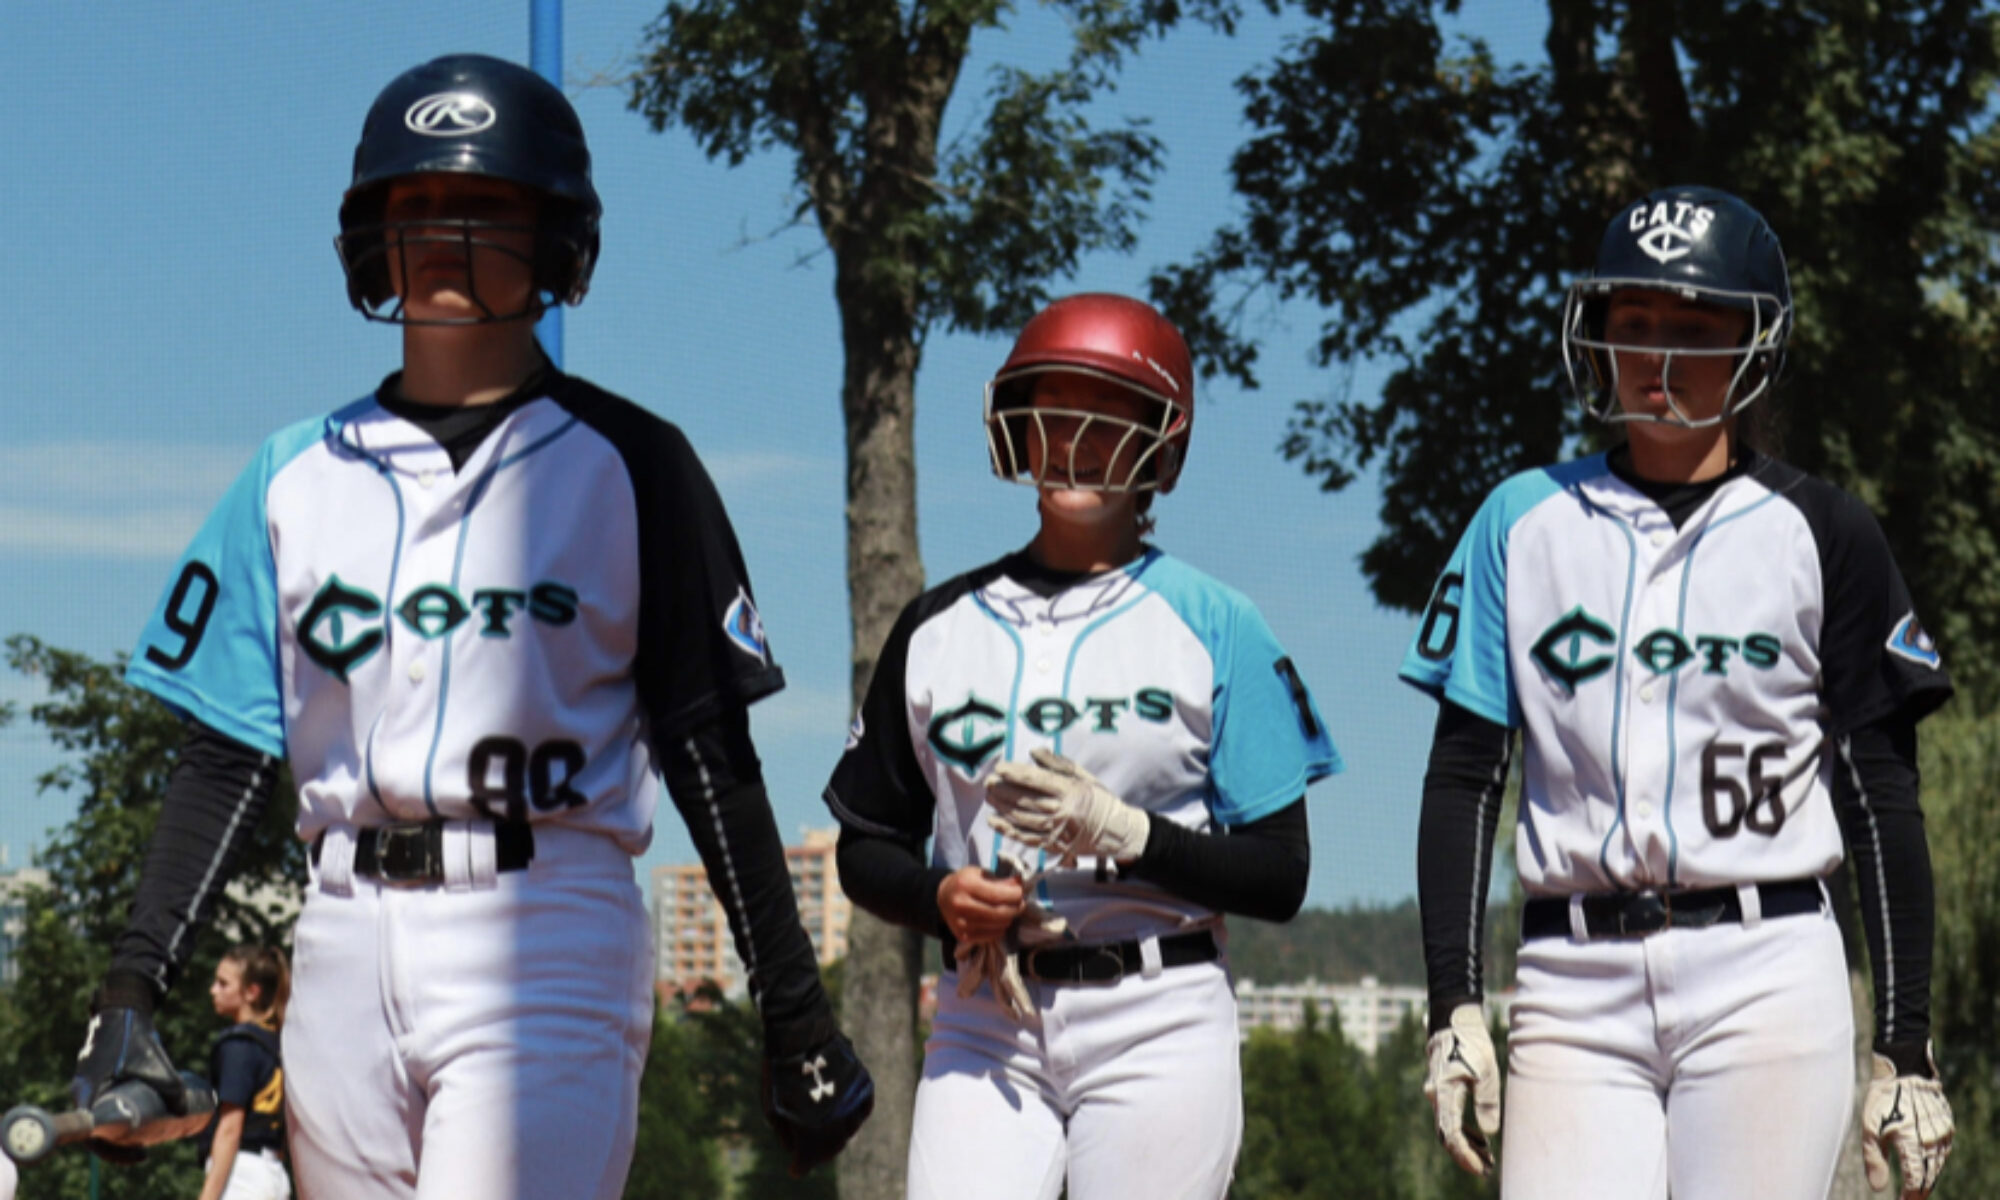 Cats Brno | softball